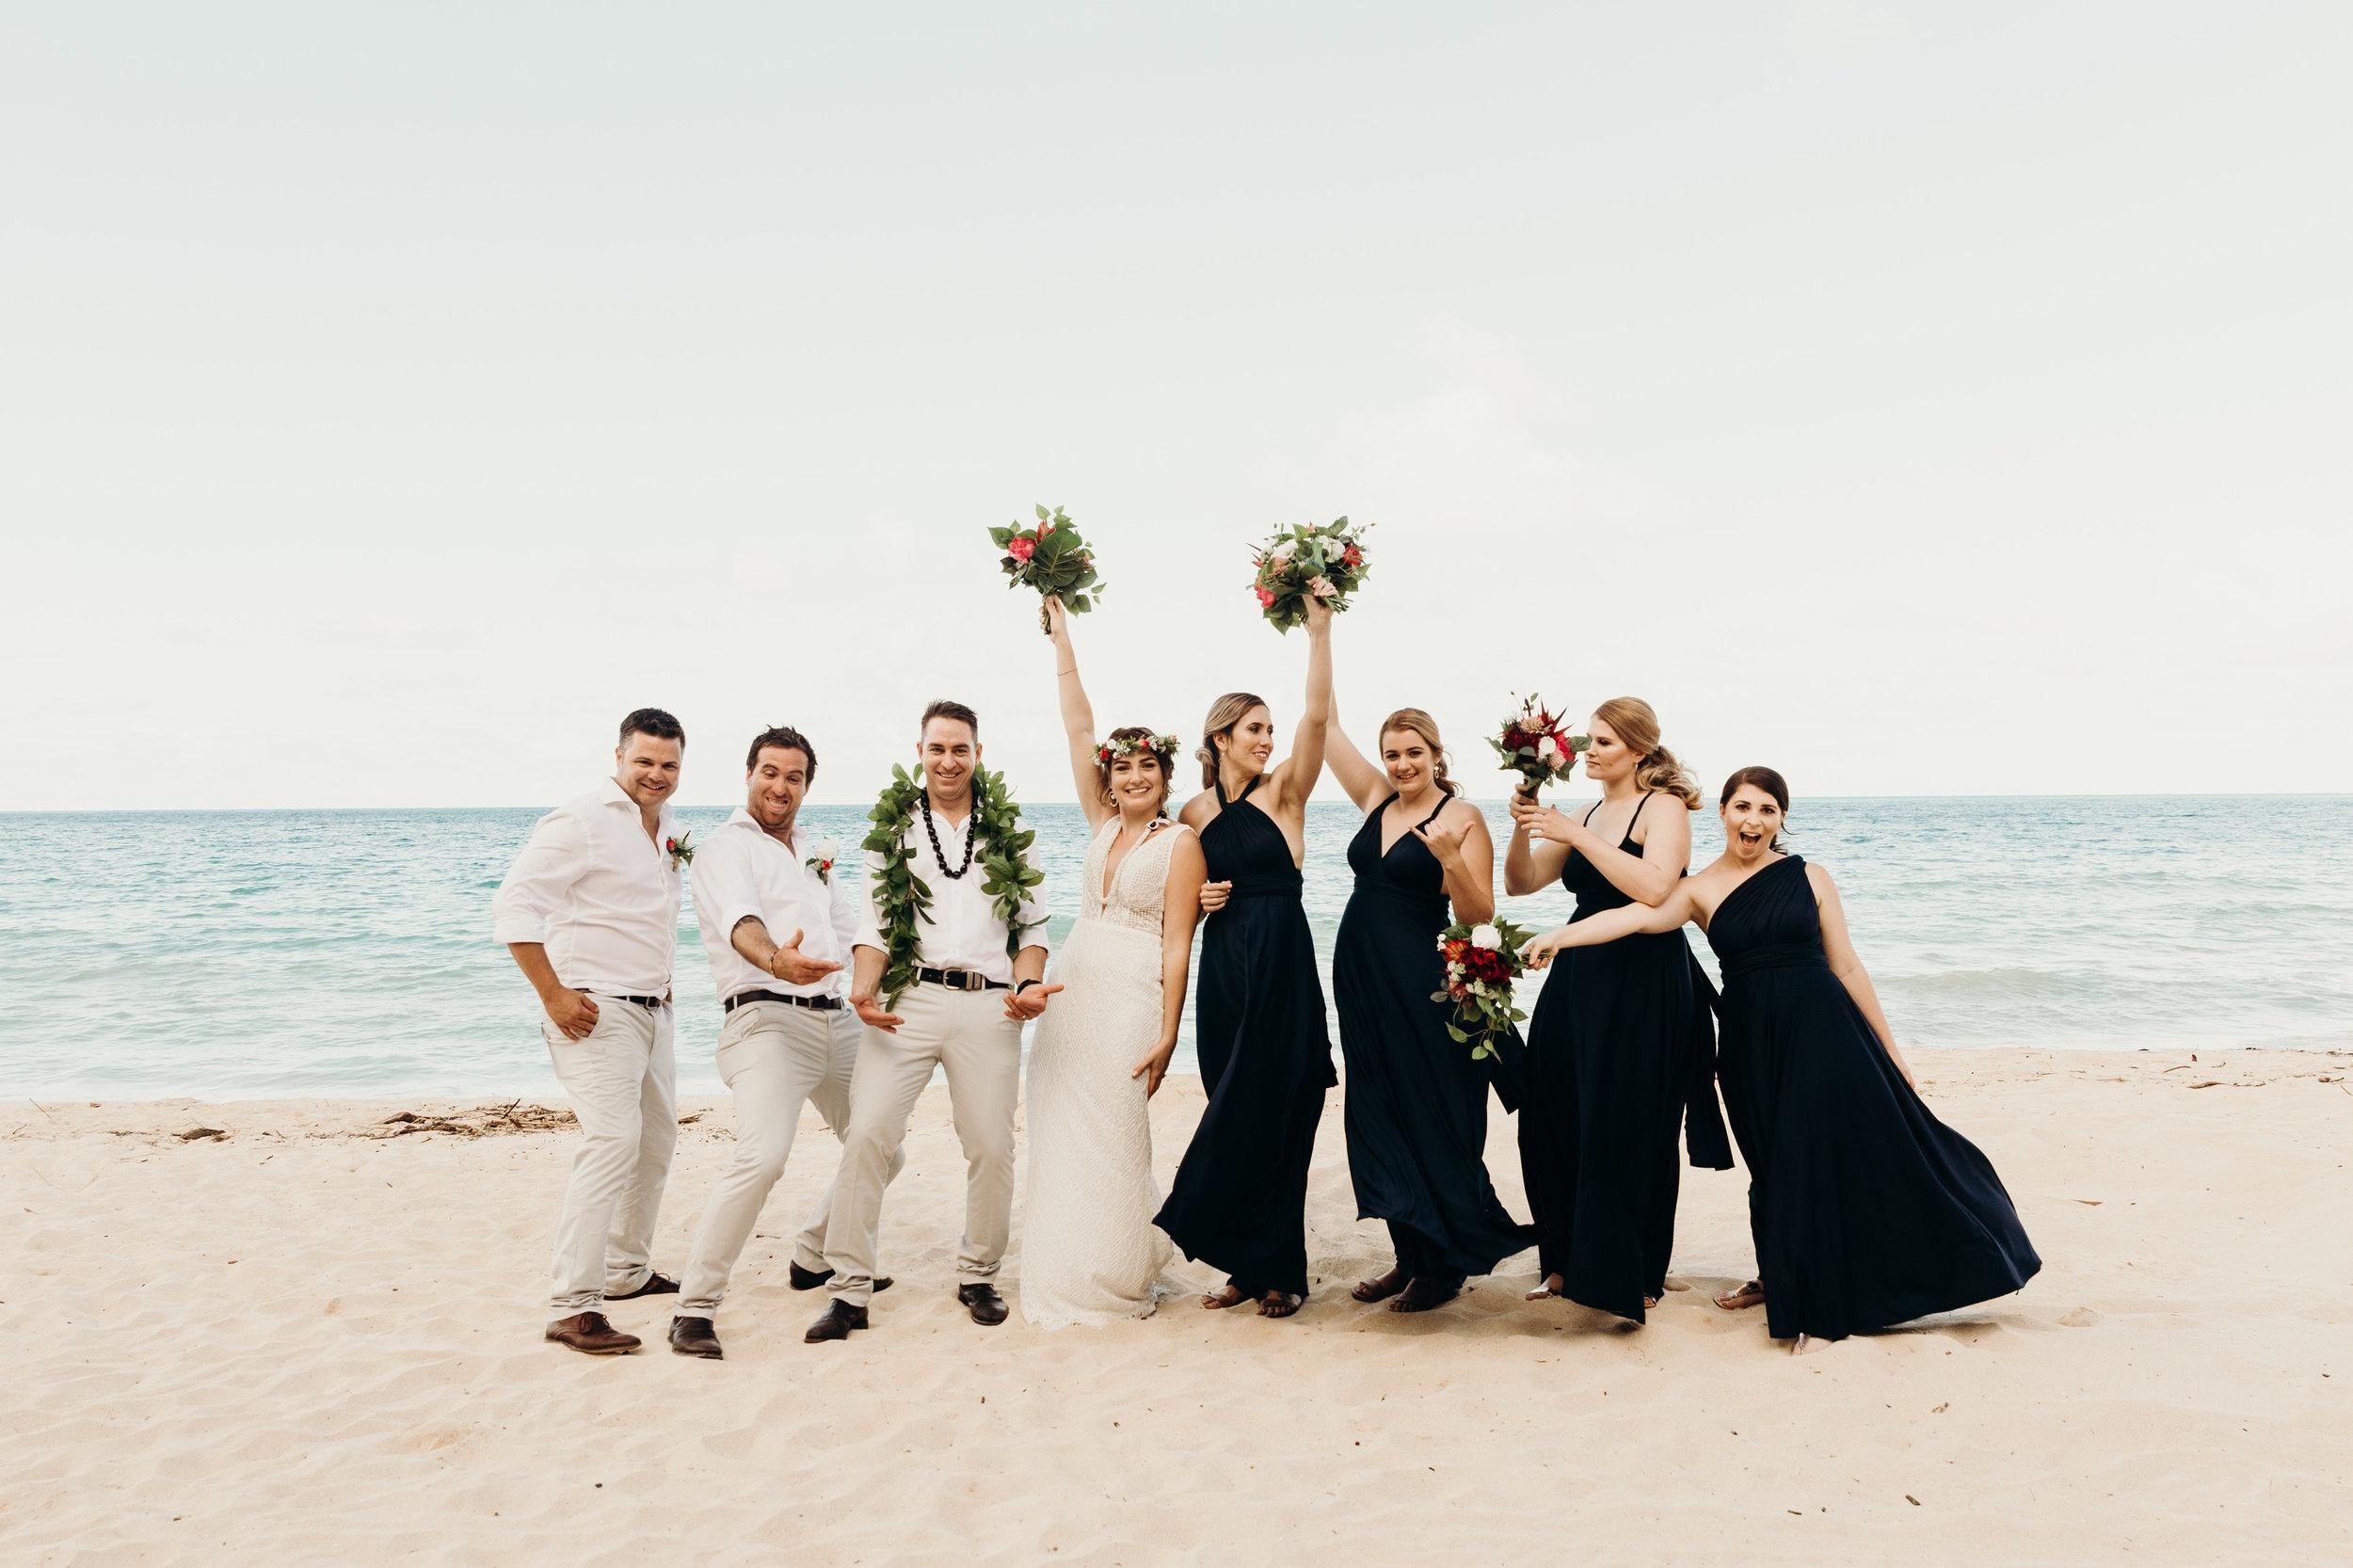 HAWAII-WEDDING-PHOTOGRAPHER-ALOHILANI-RESORT-KEANI-BAKULA-43.jpg